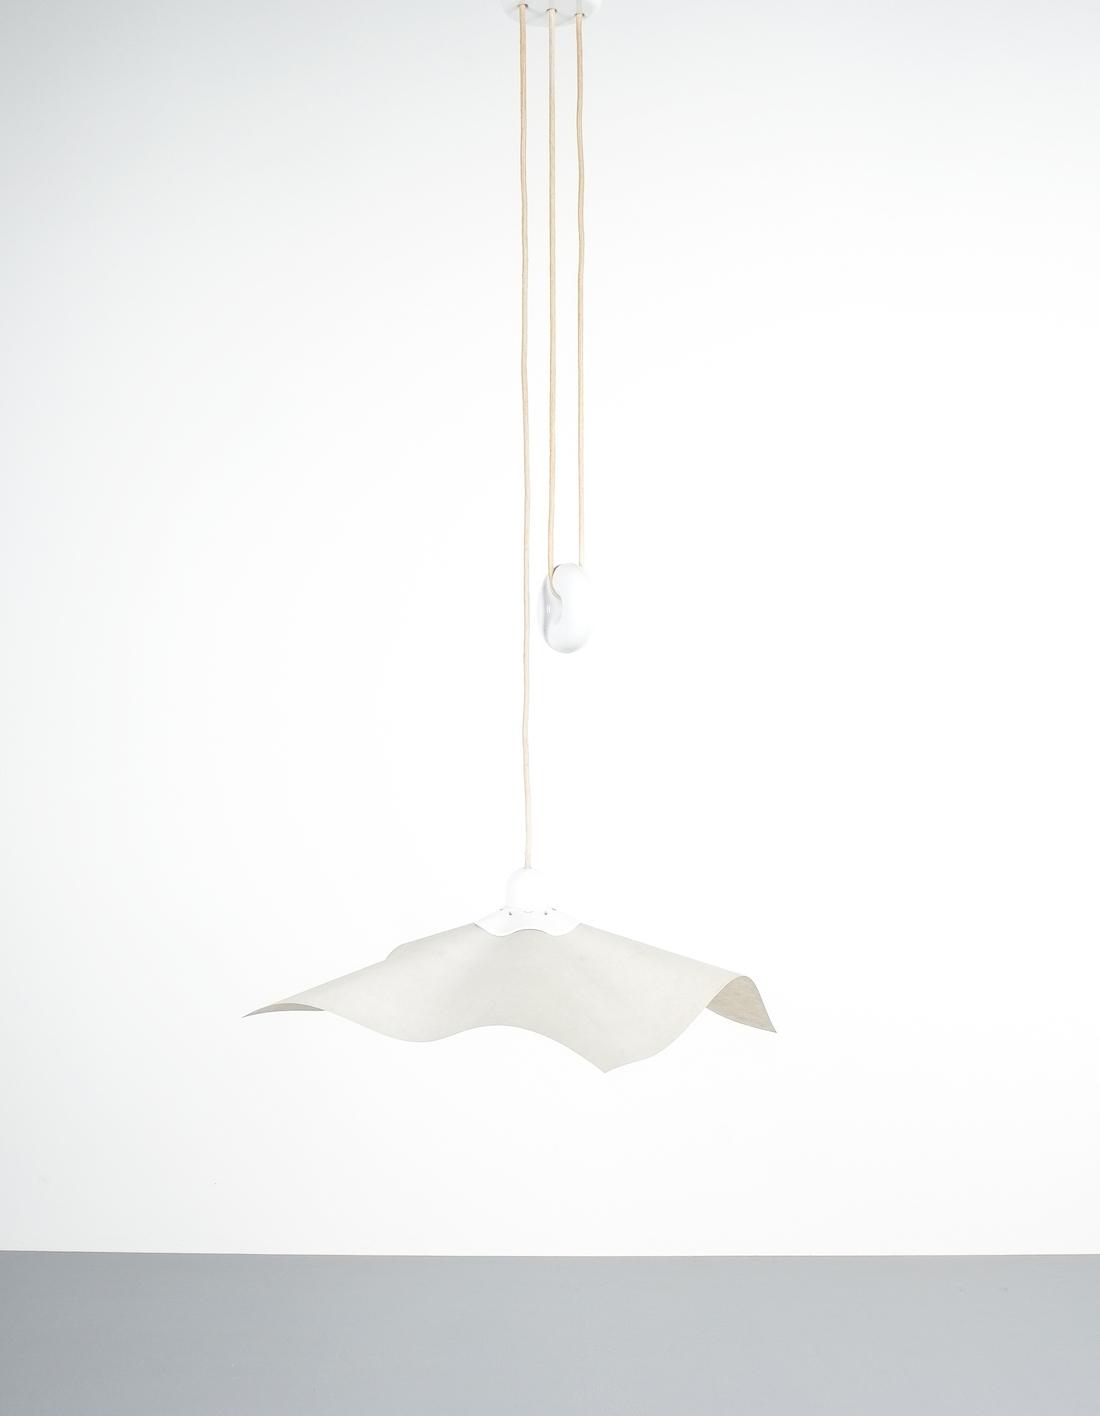 Mario bellini rare area counterweight pendant lamp by artemide1976 mario bellini rare area counterweight pendant lamp by artemide italy 1976 mozeypictures Image collections